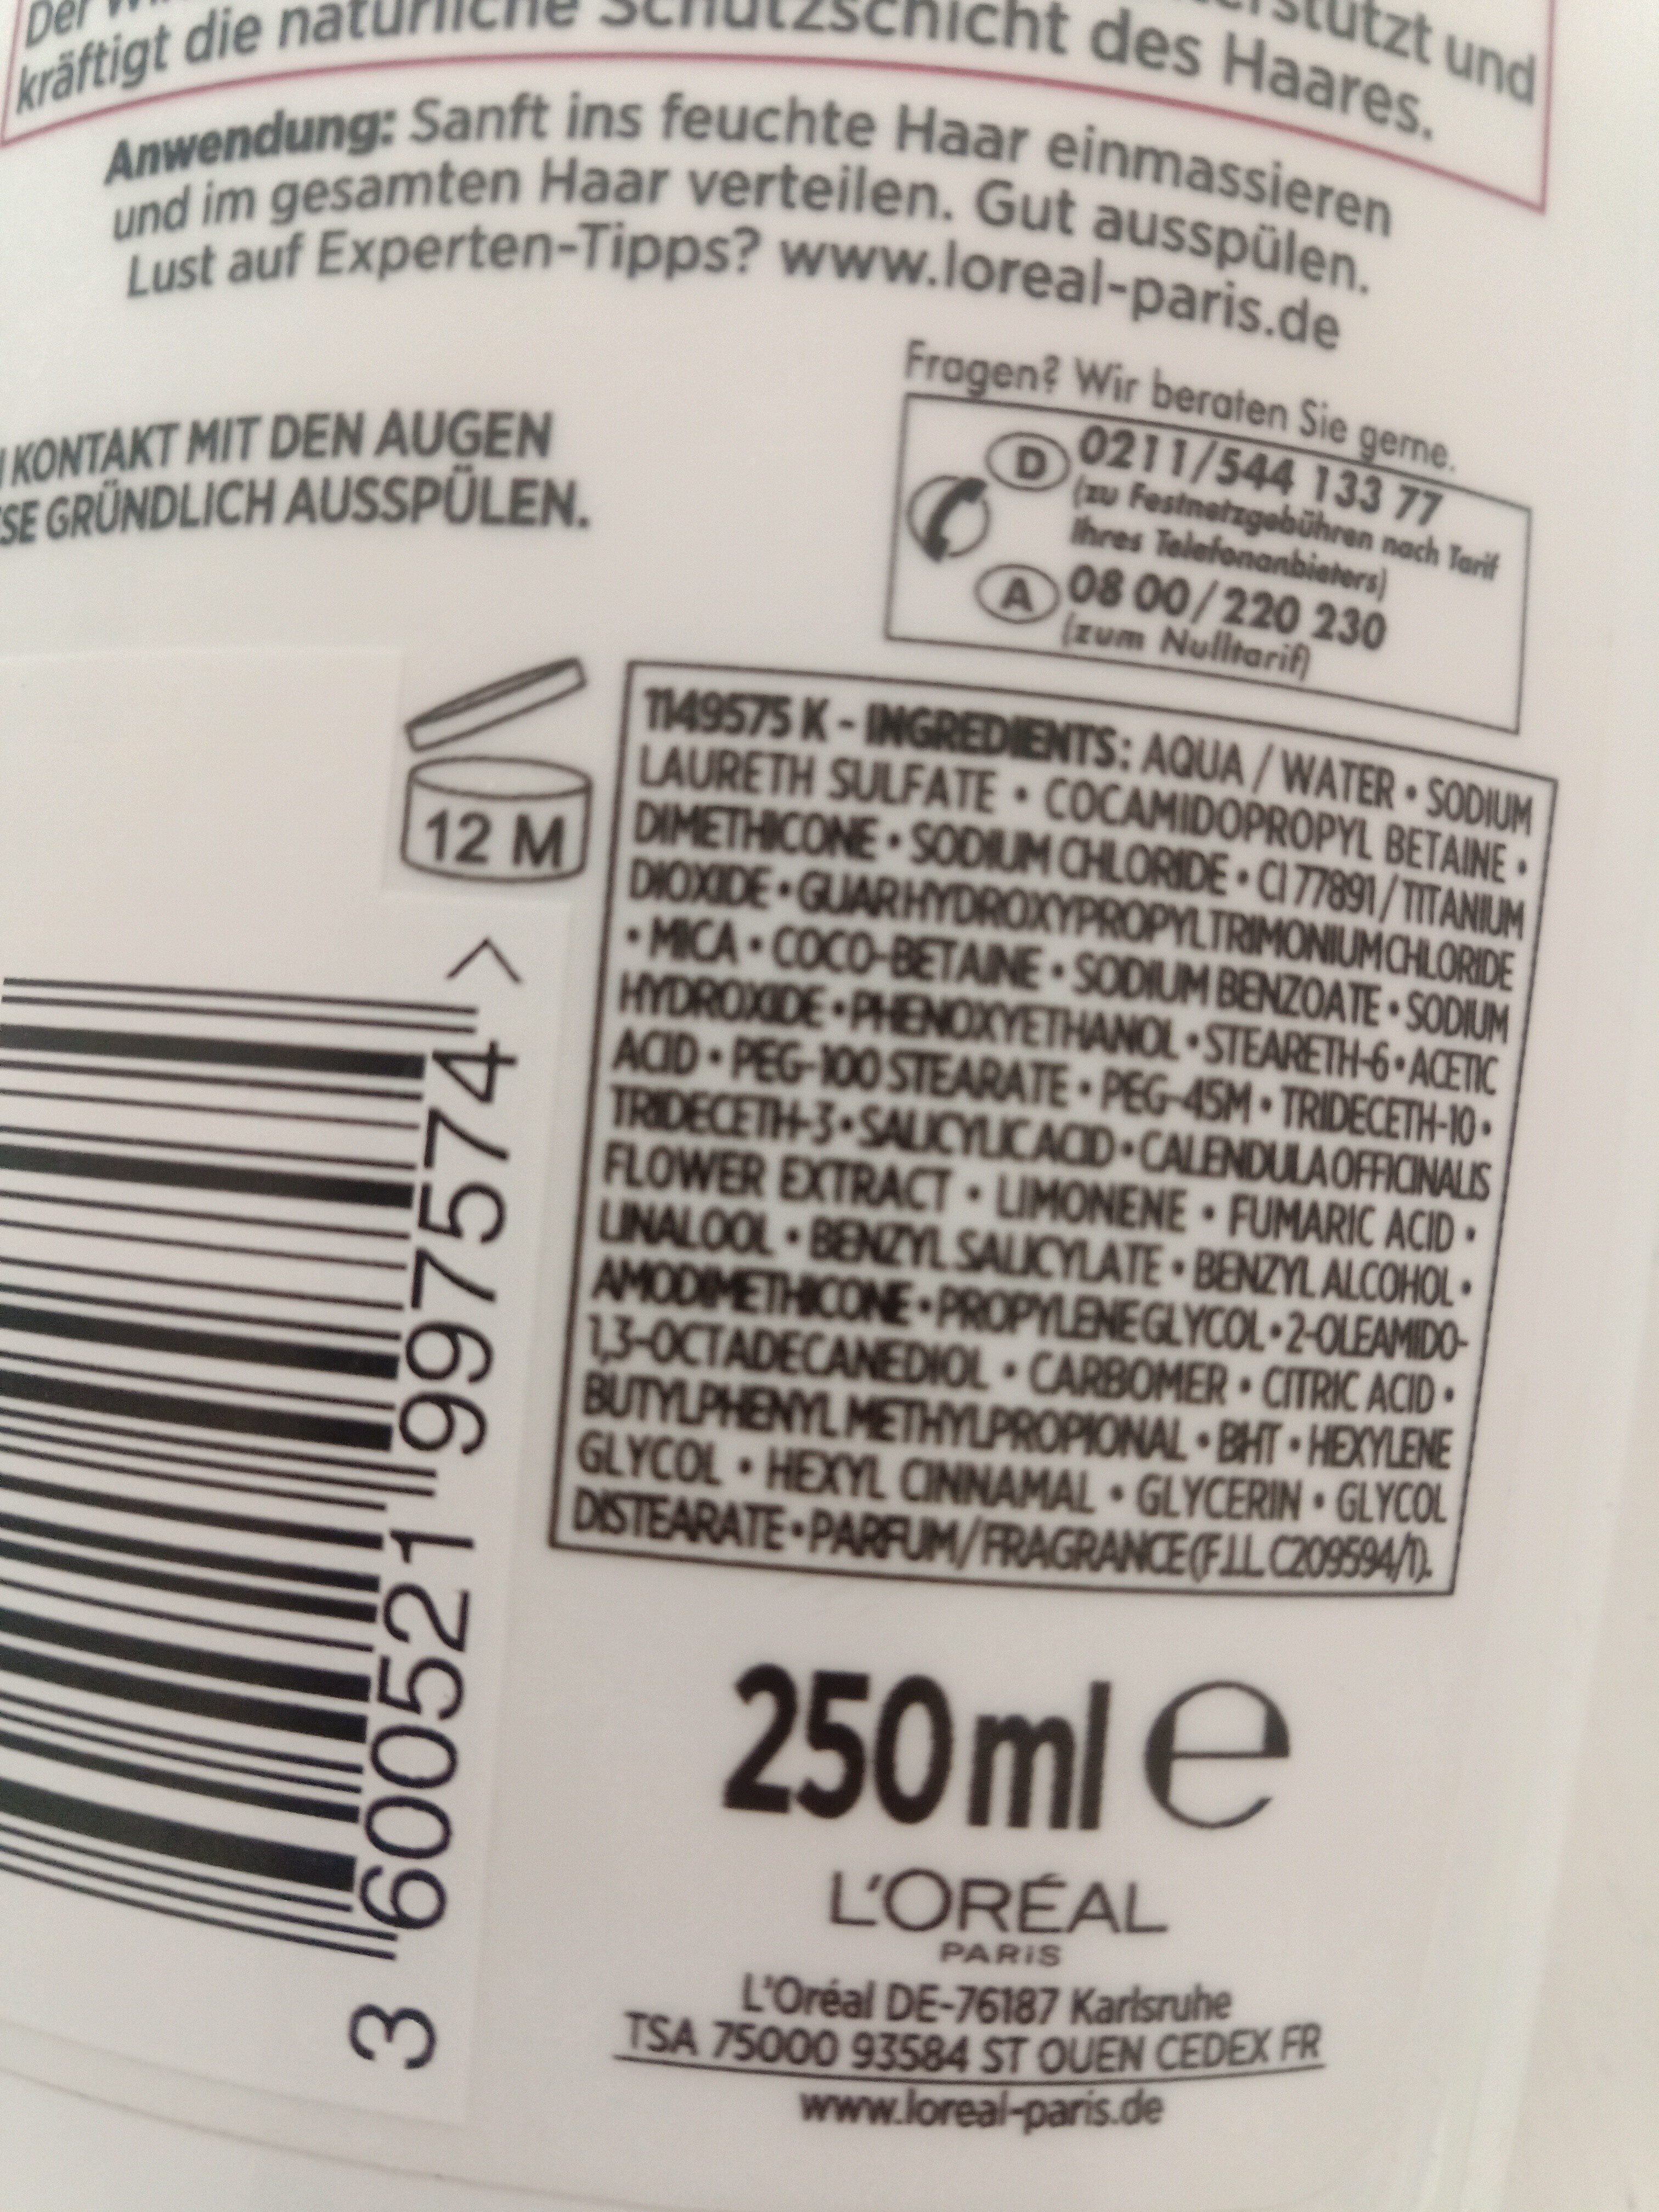 l'oréal paris elvital shampoo - Ingredients - en